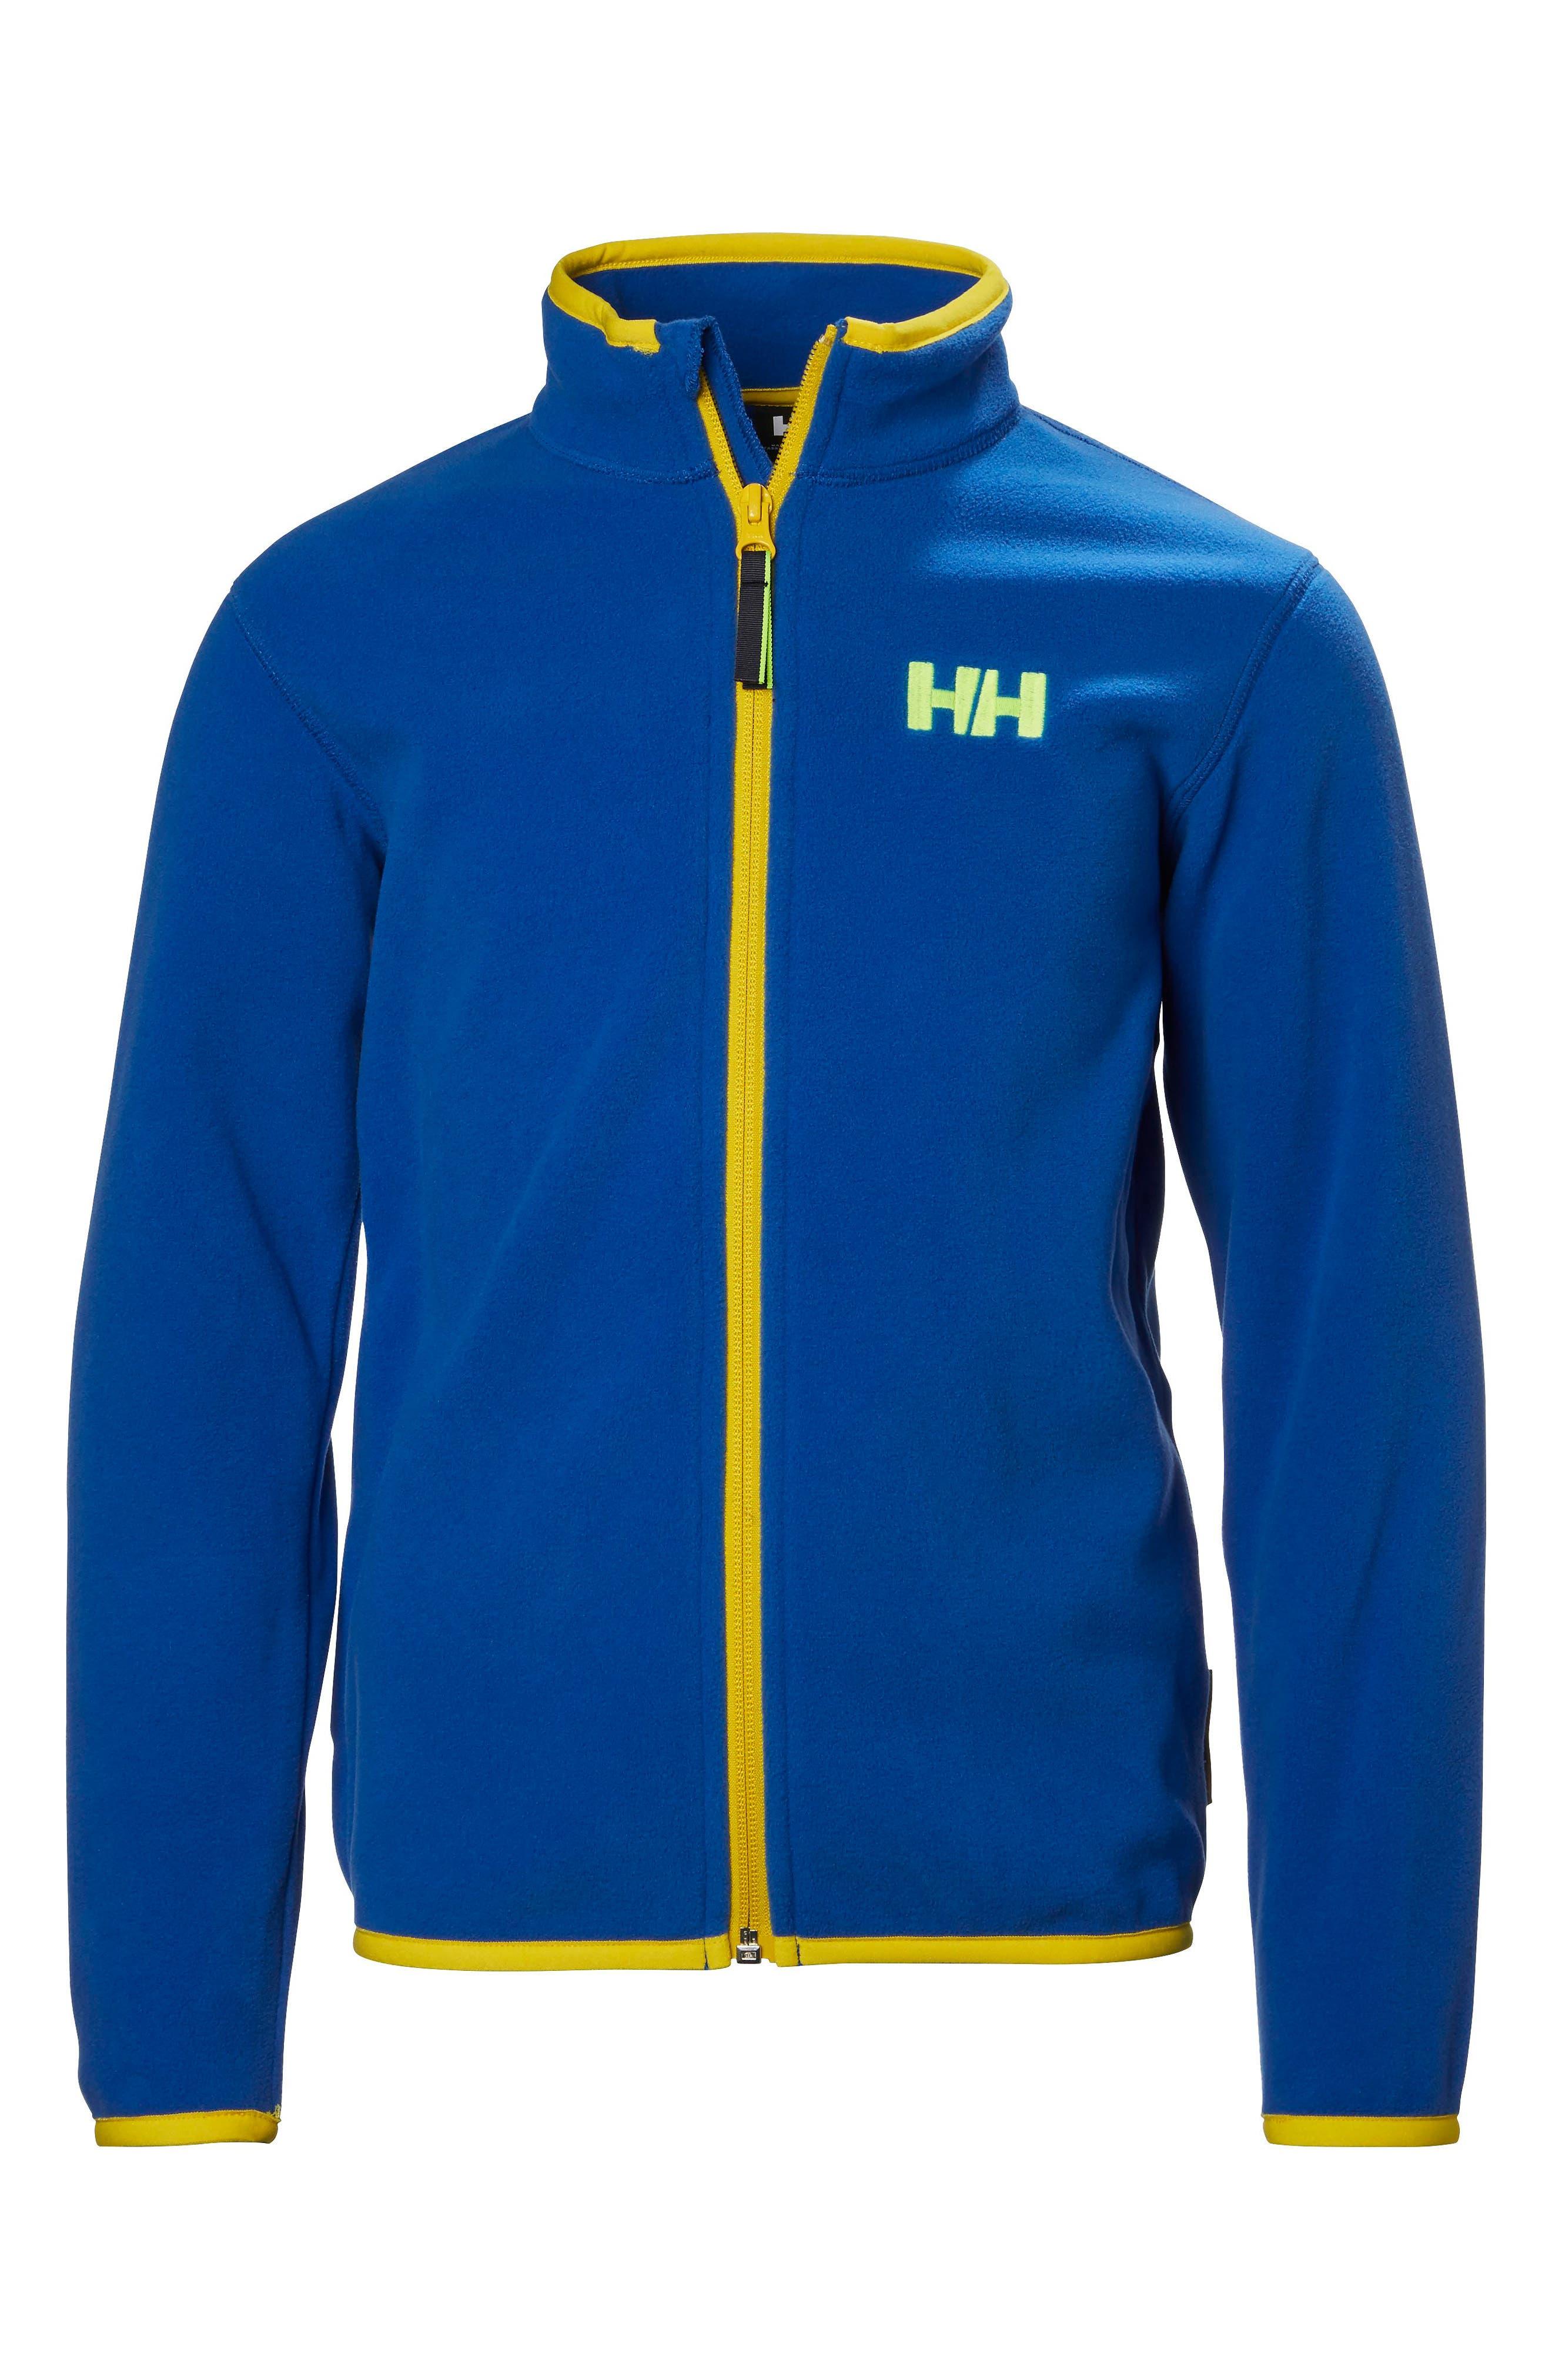 Main Image - Helly Hansen Jr. Daybreaker Polartec® Fleece Jacket (Big Boys)